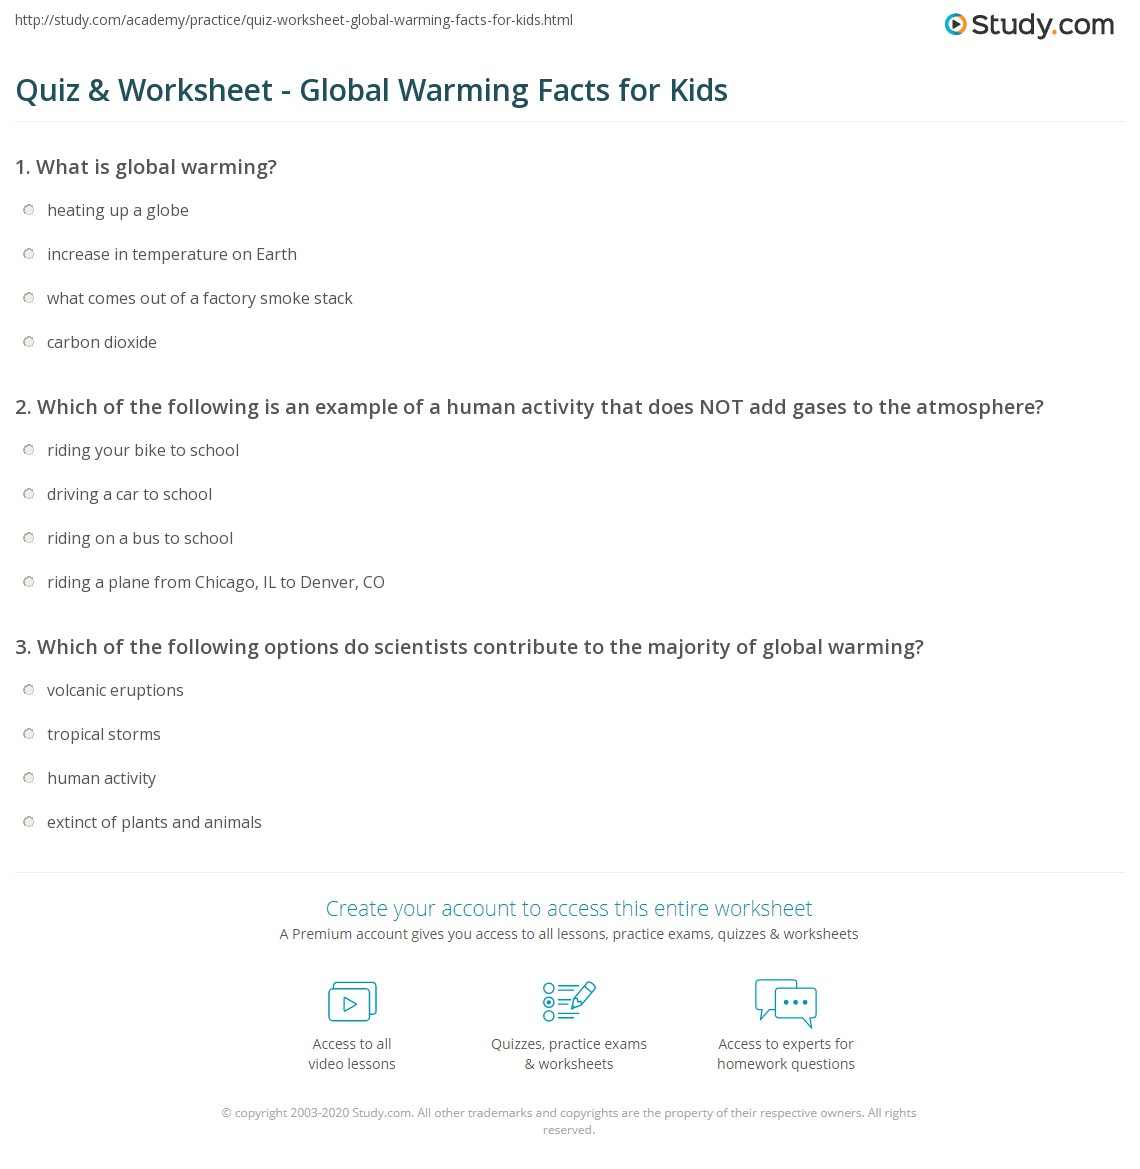 Worksheets Global Warming Worksheets quiz worksheet global warming facts for kids study com print what is definition lesson worksheet